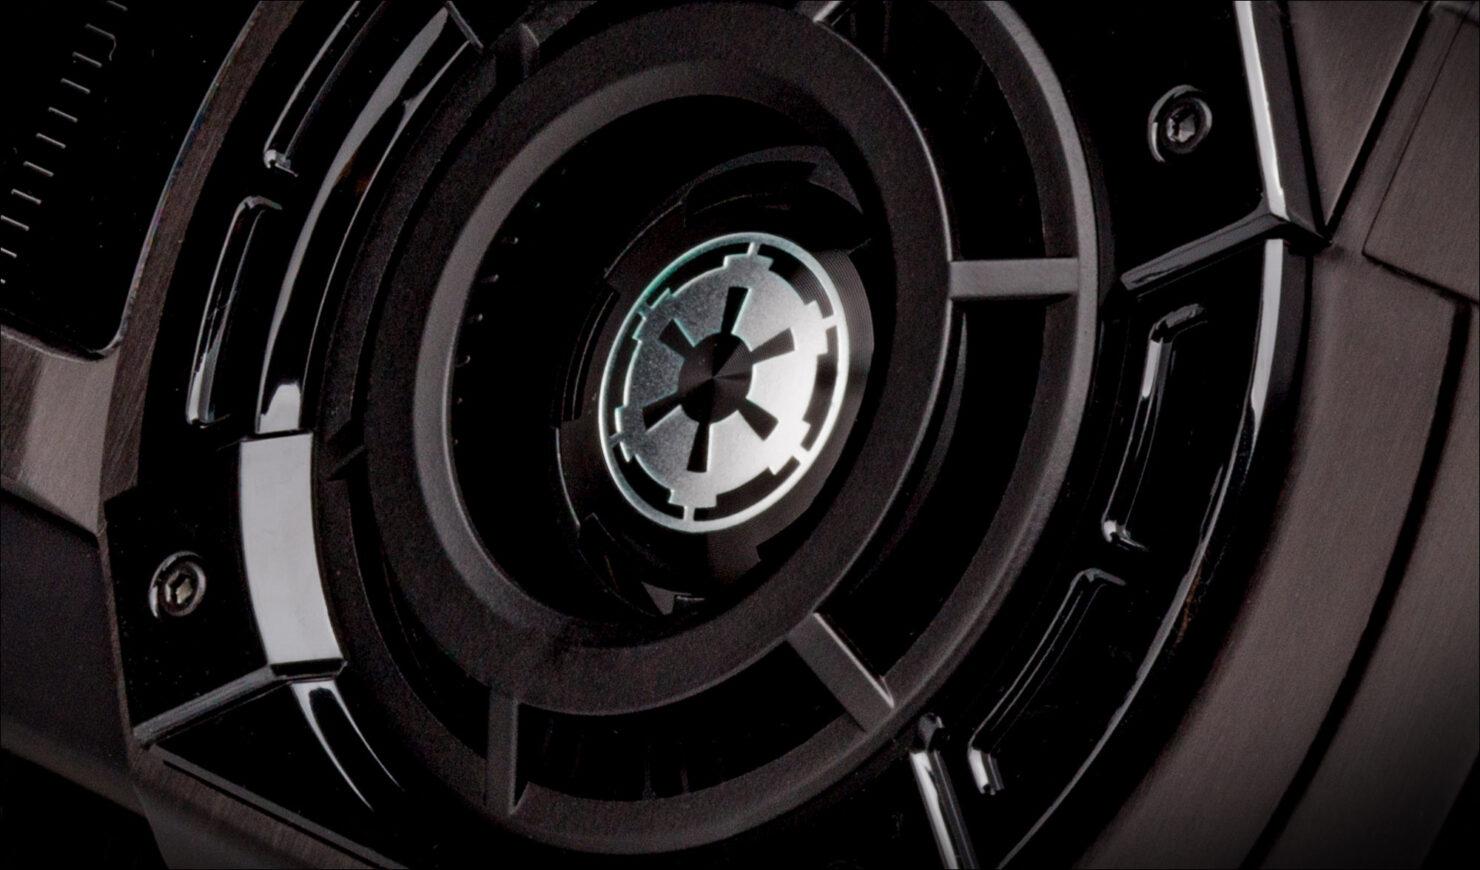 nvidia-titan-xp-ce-star-wars-galactic-empire-gallery-05-2